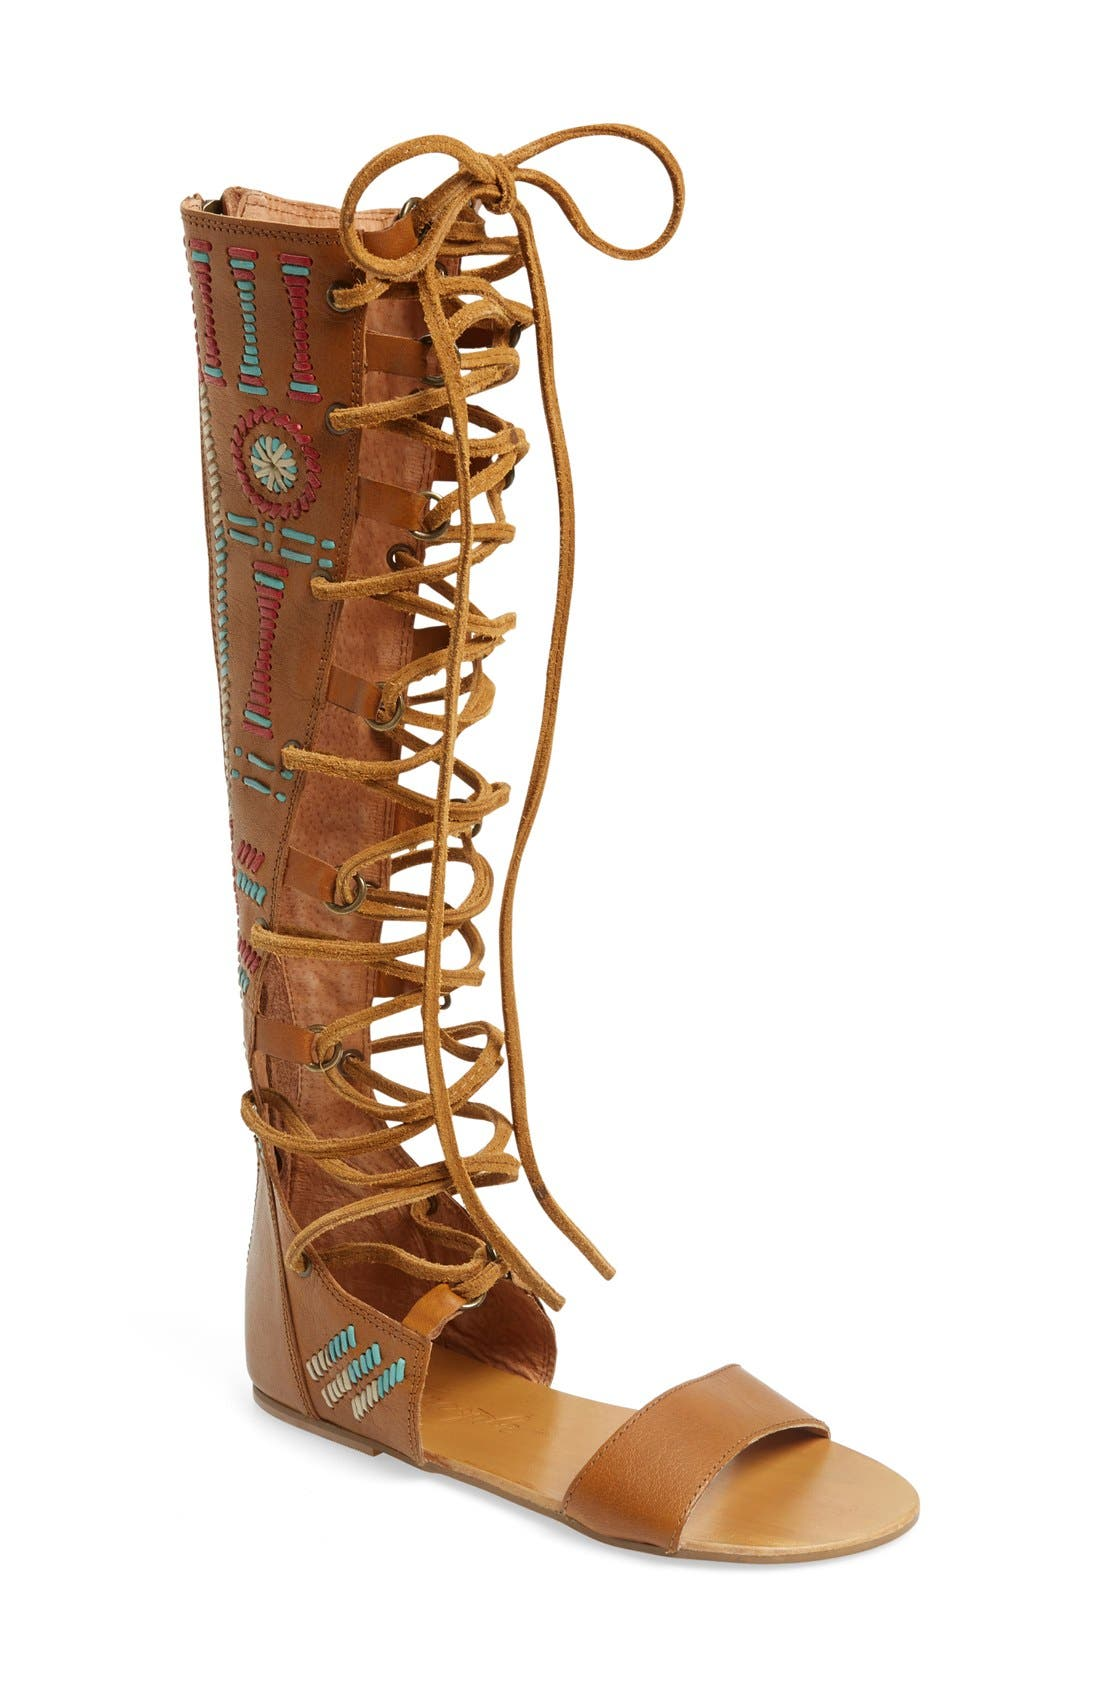 Alternate Image 1 Selected - Free People 'Bellflower' Tall Gladiator Sandal (Women)